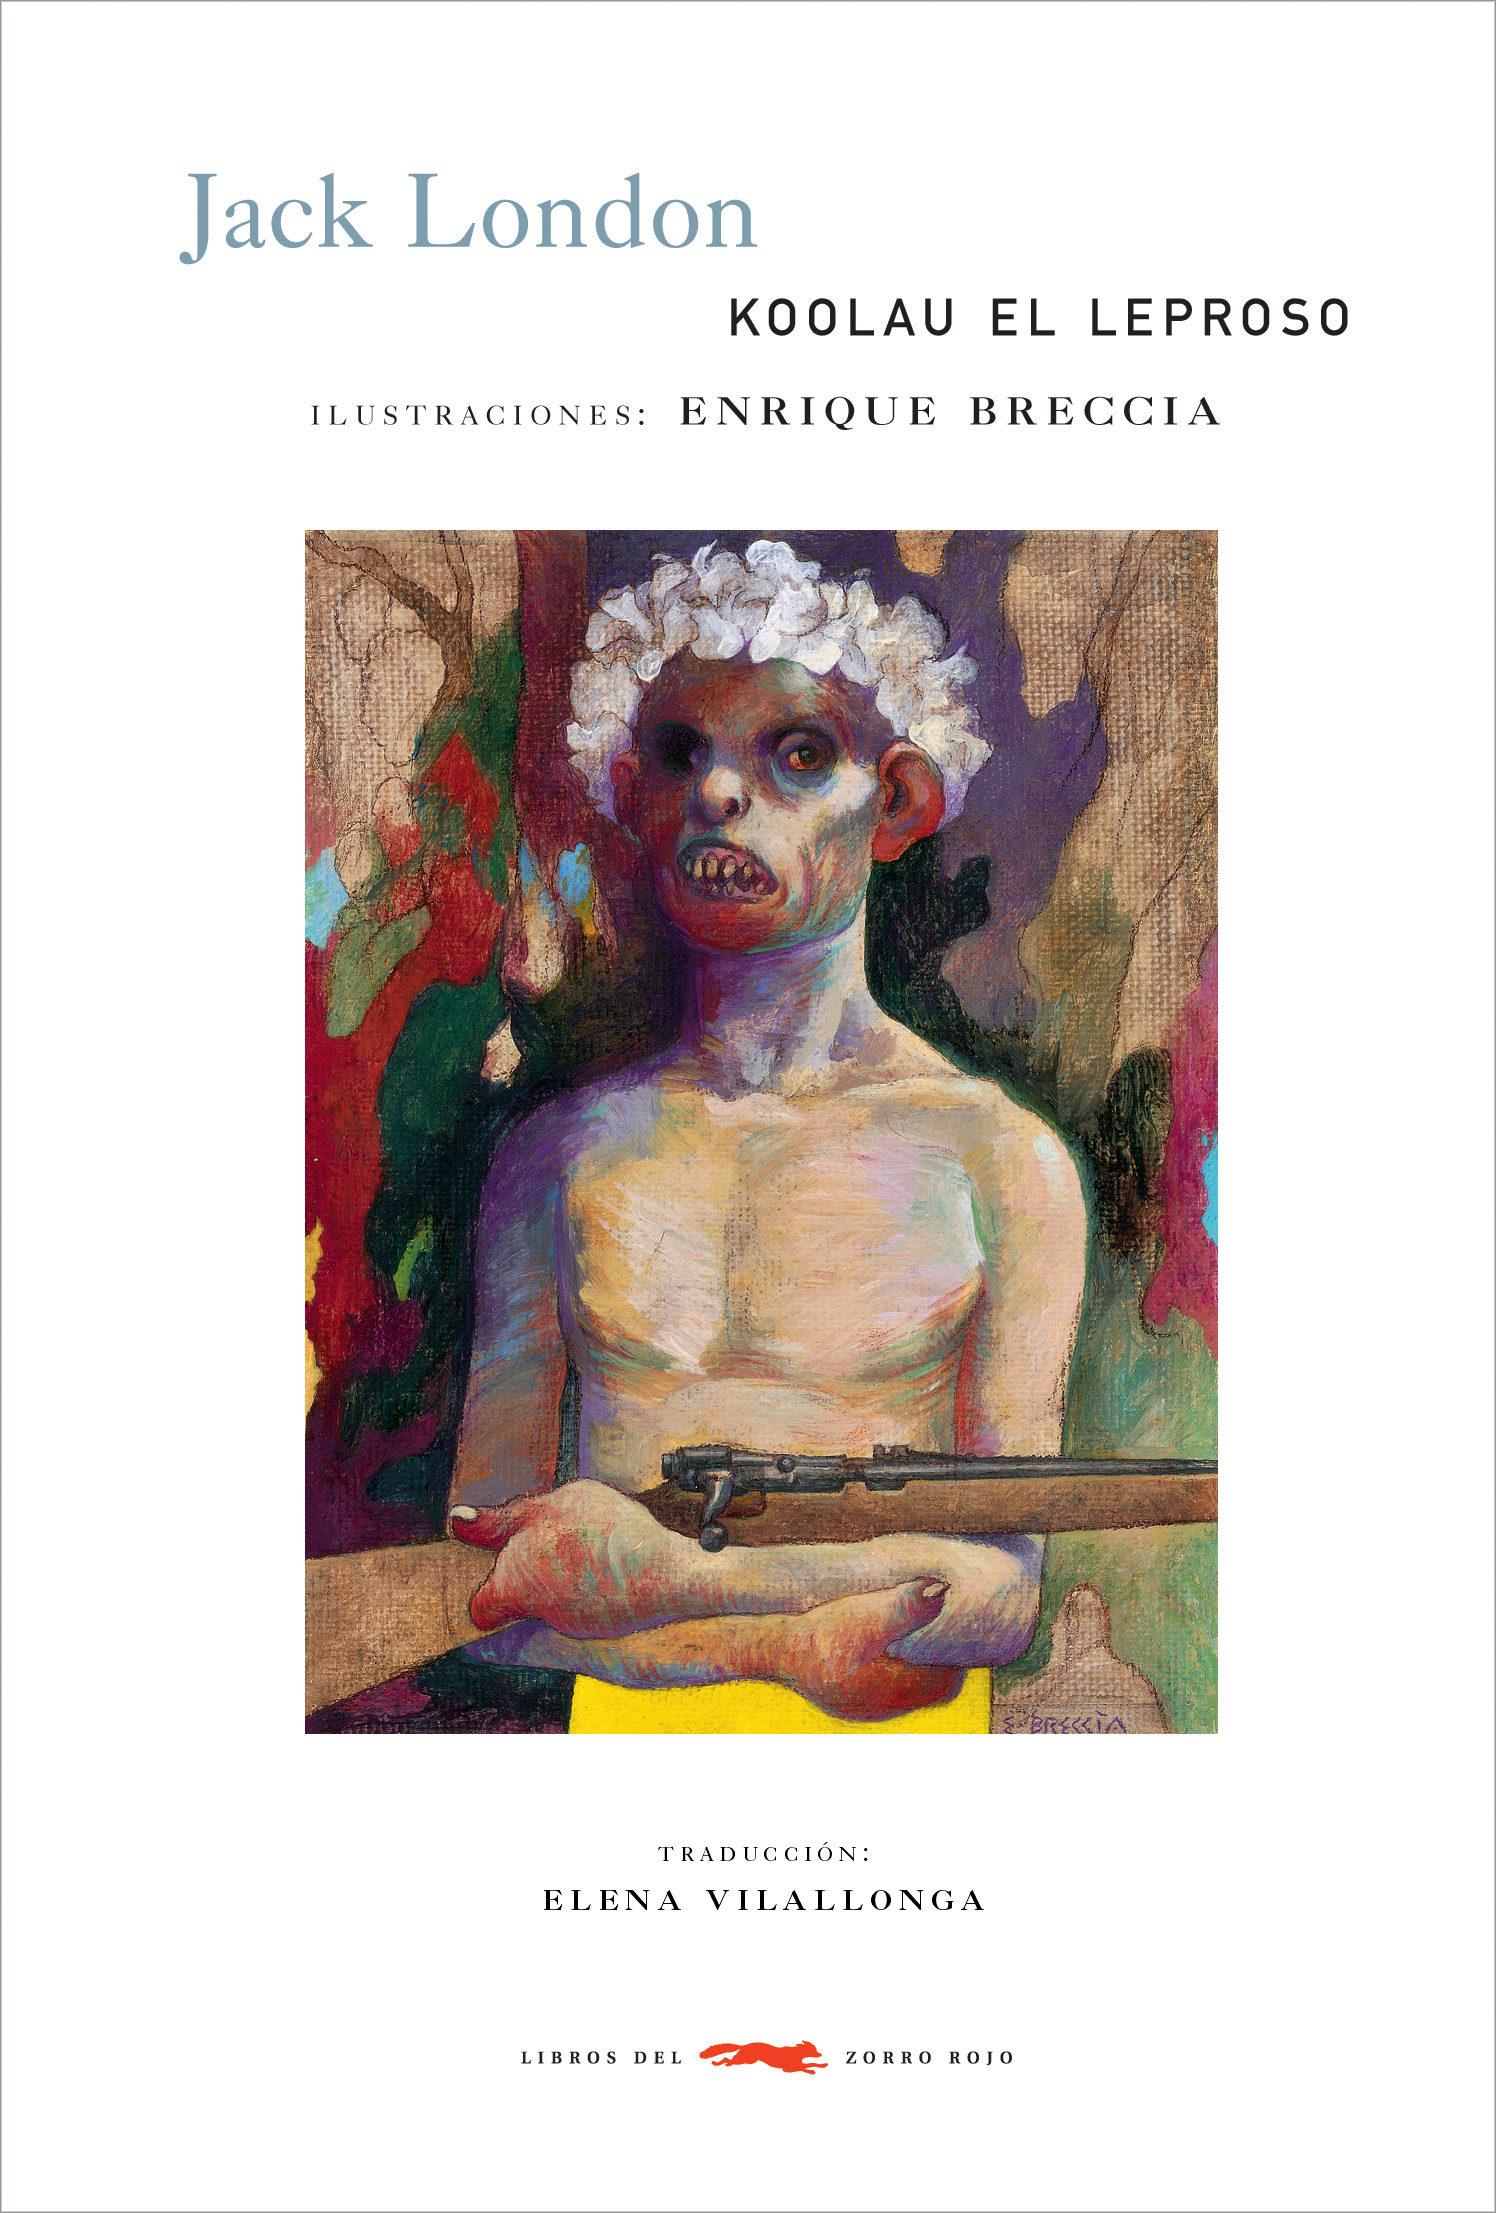 Koolau el Leproso - Jack London - Libros Del Zorro Rojo